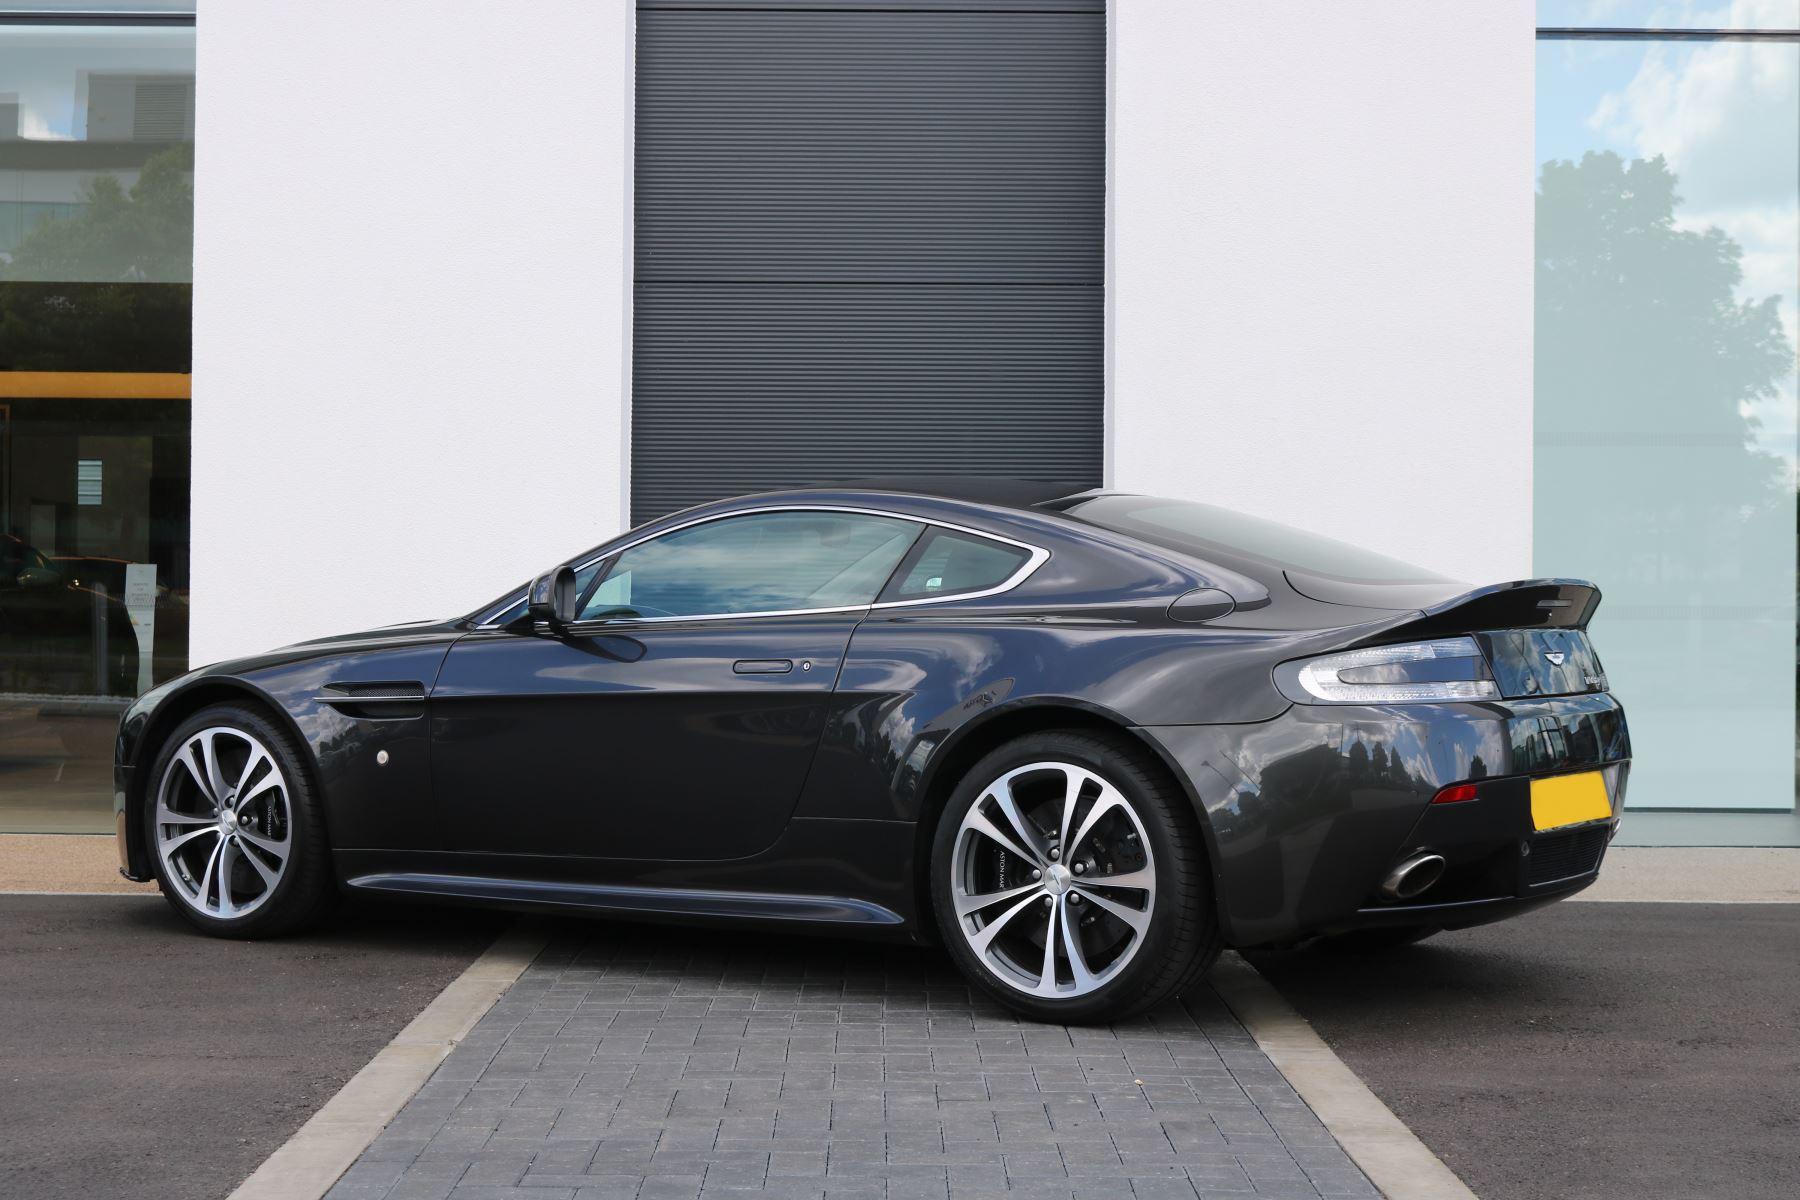 Aston Martin V12 Vantage 2dr image 4